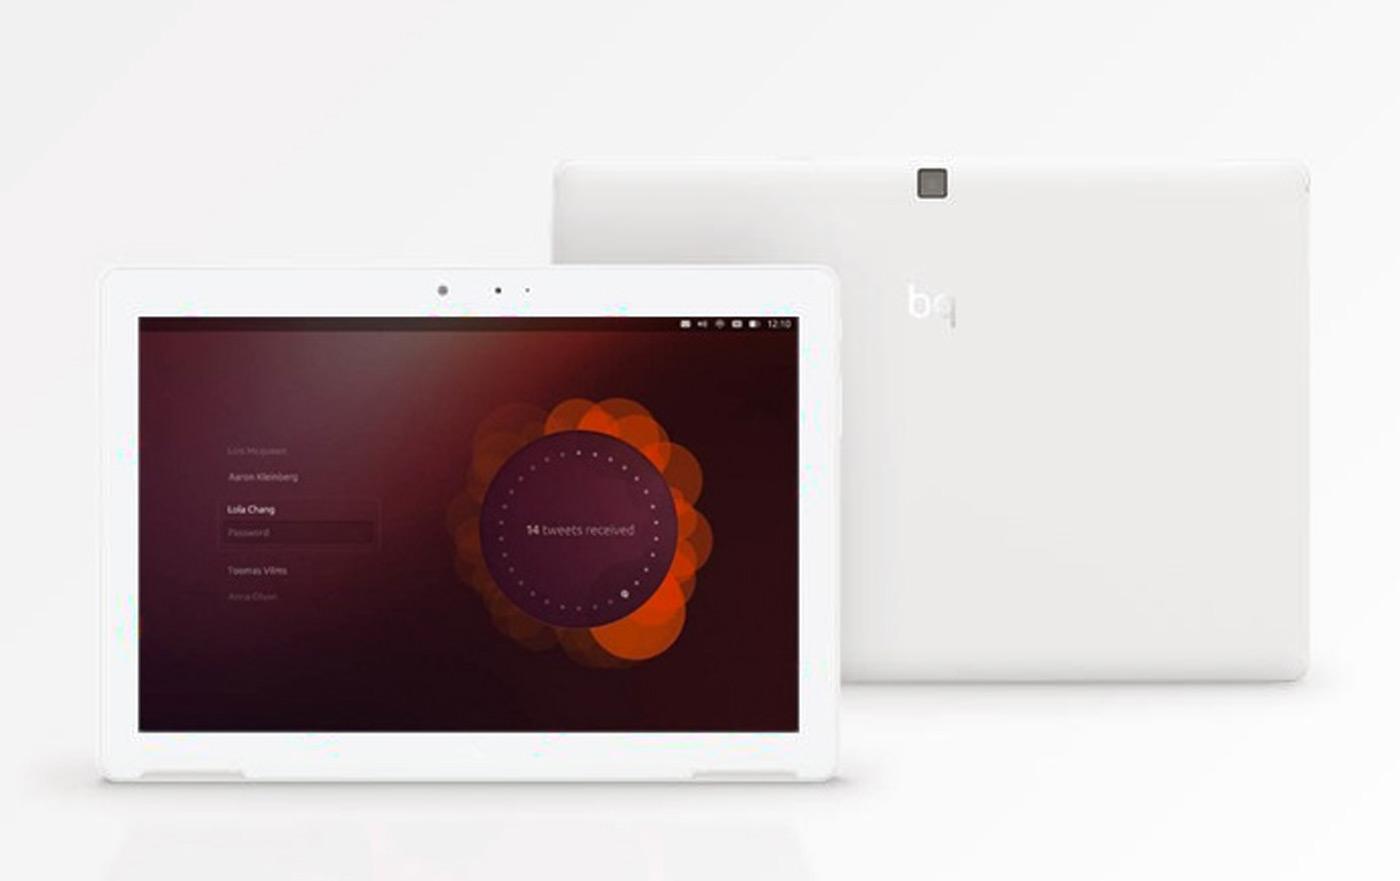 bq-aquarius-m10-ubuntu